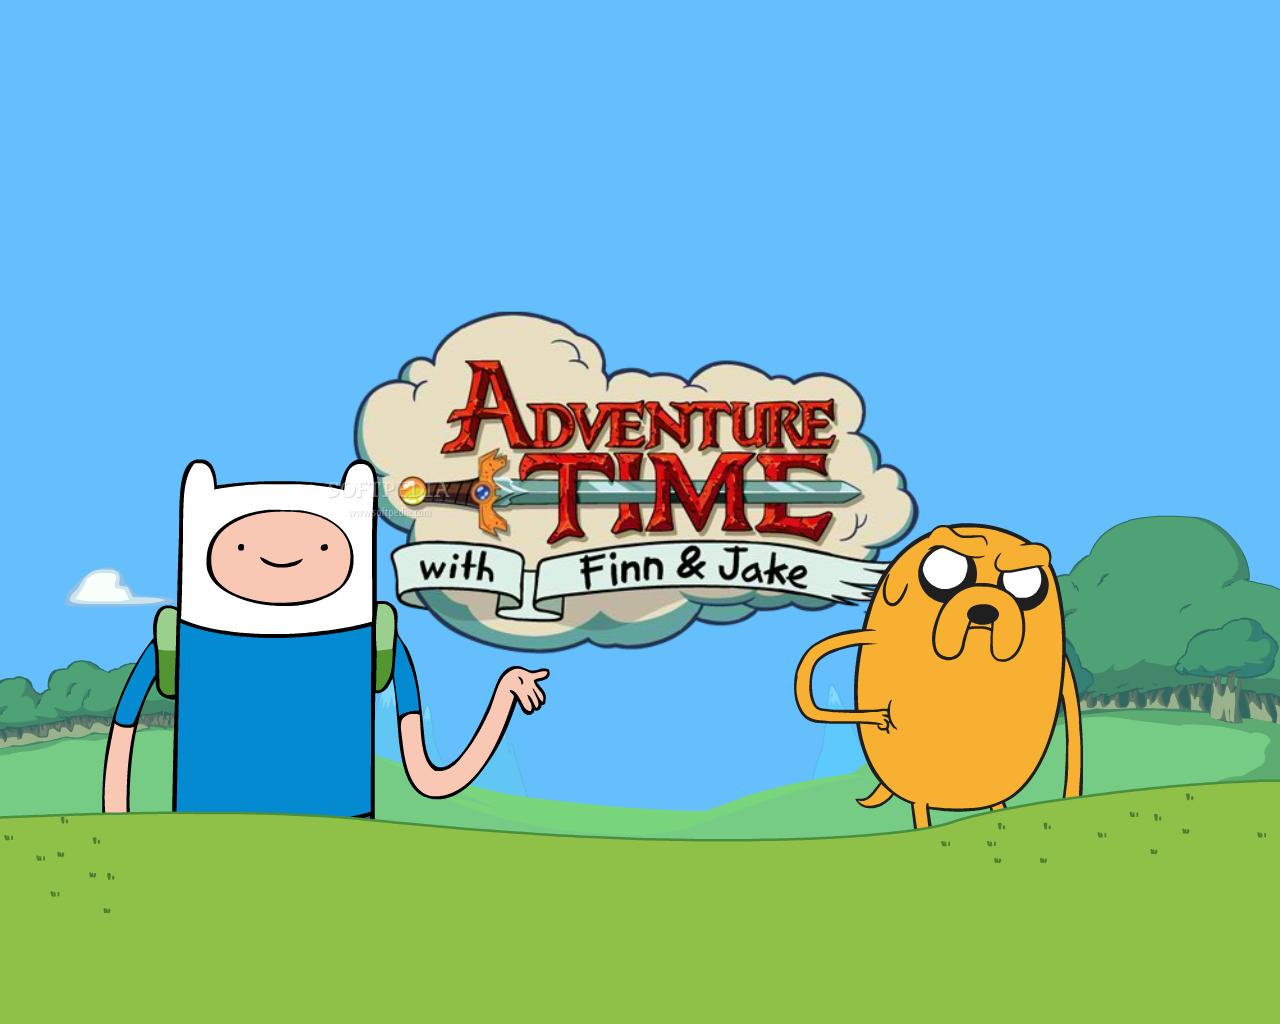 Adventure Time Wallpaper 1280x1024 Adventure Time Finn The Human 1280x1024